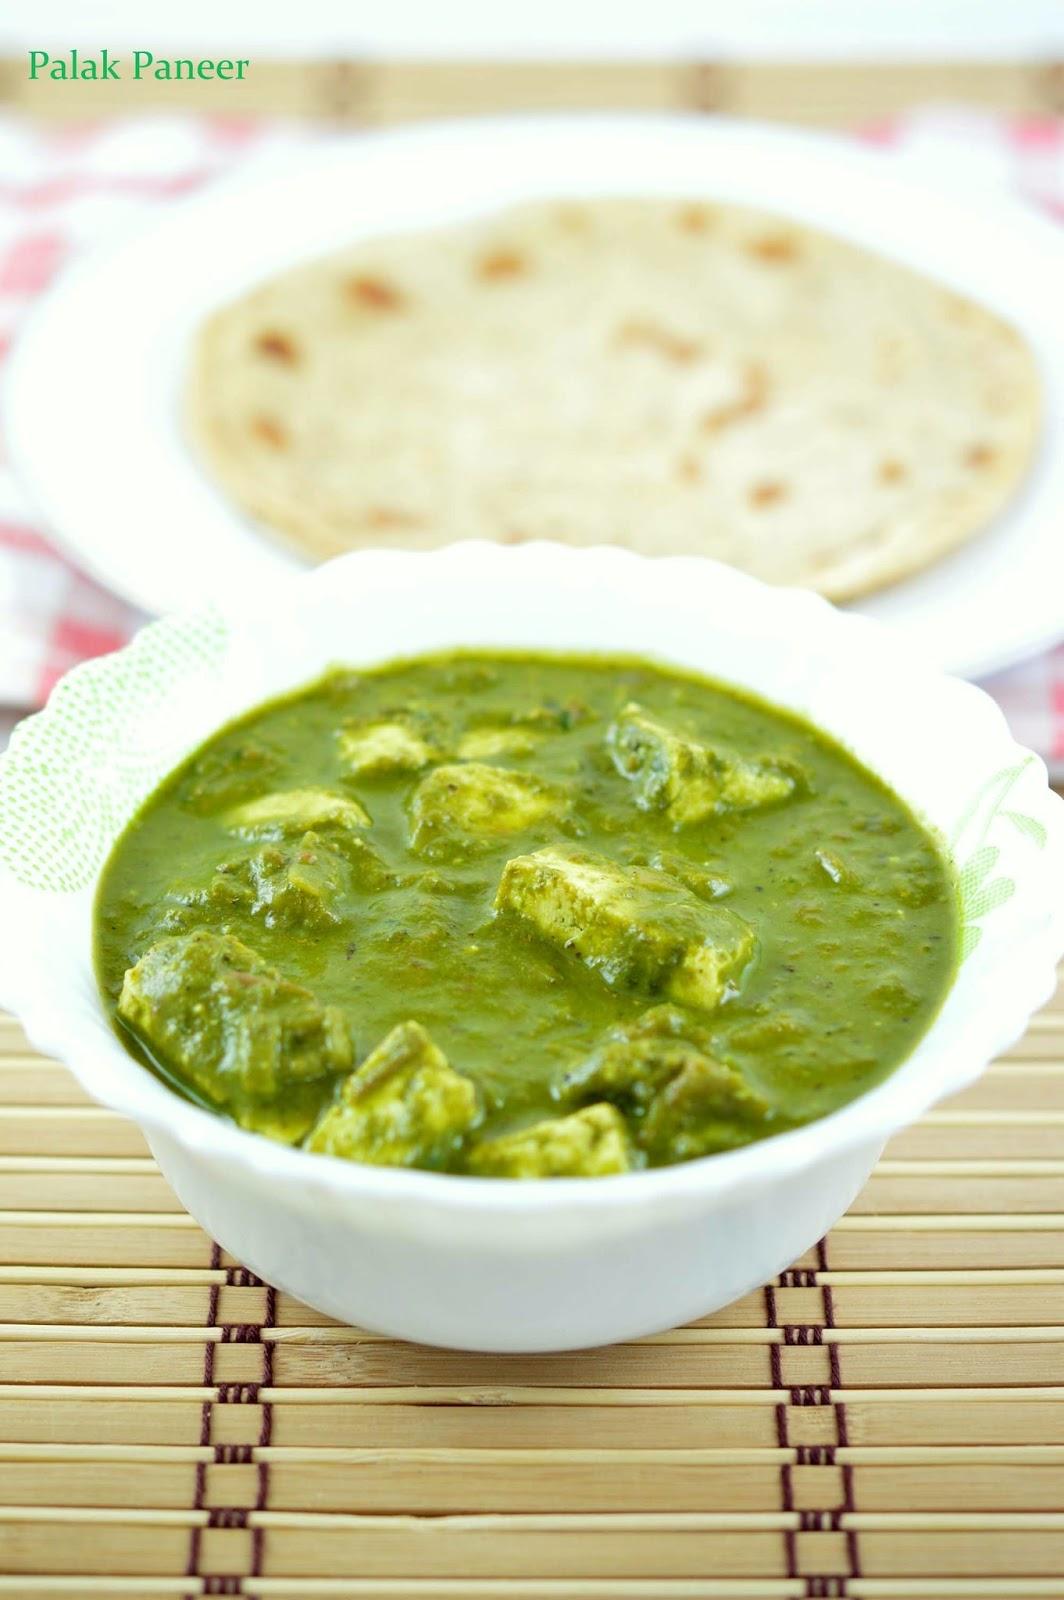 PavisPassion: Palak Paneer Recipe - How to make Palak ...